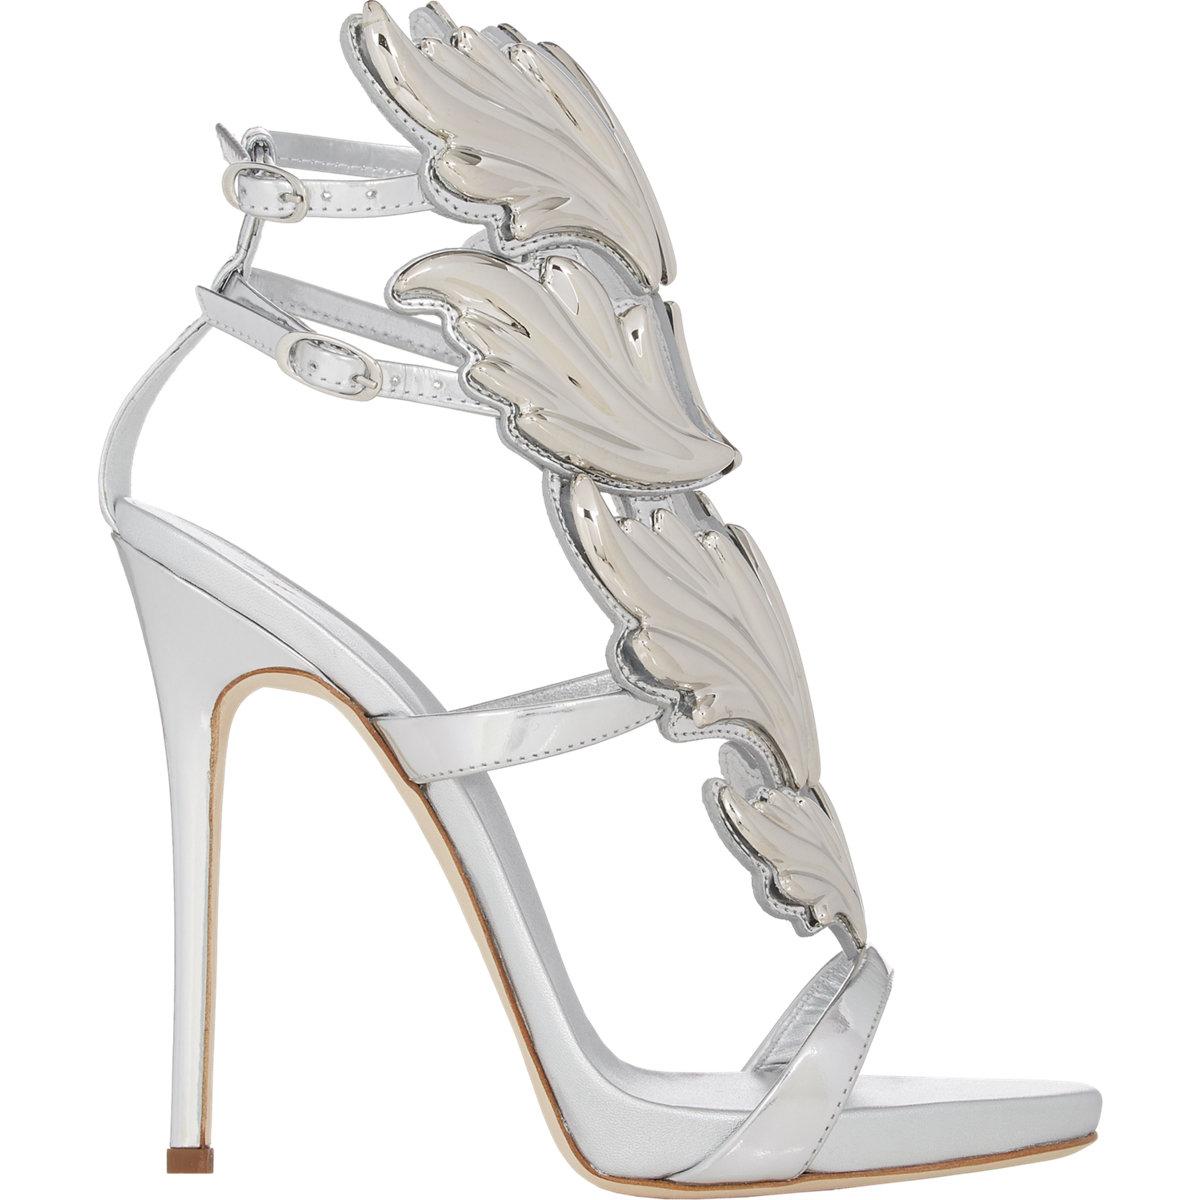 69690eda28b Lyst - Giuseppe Zanotti cruel Summer Sandals in Metallic